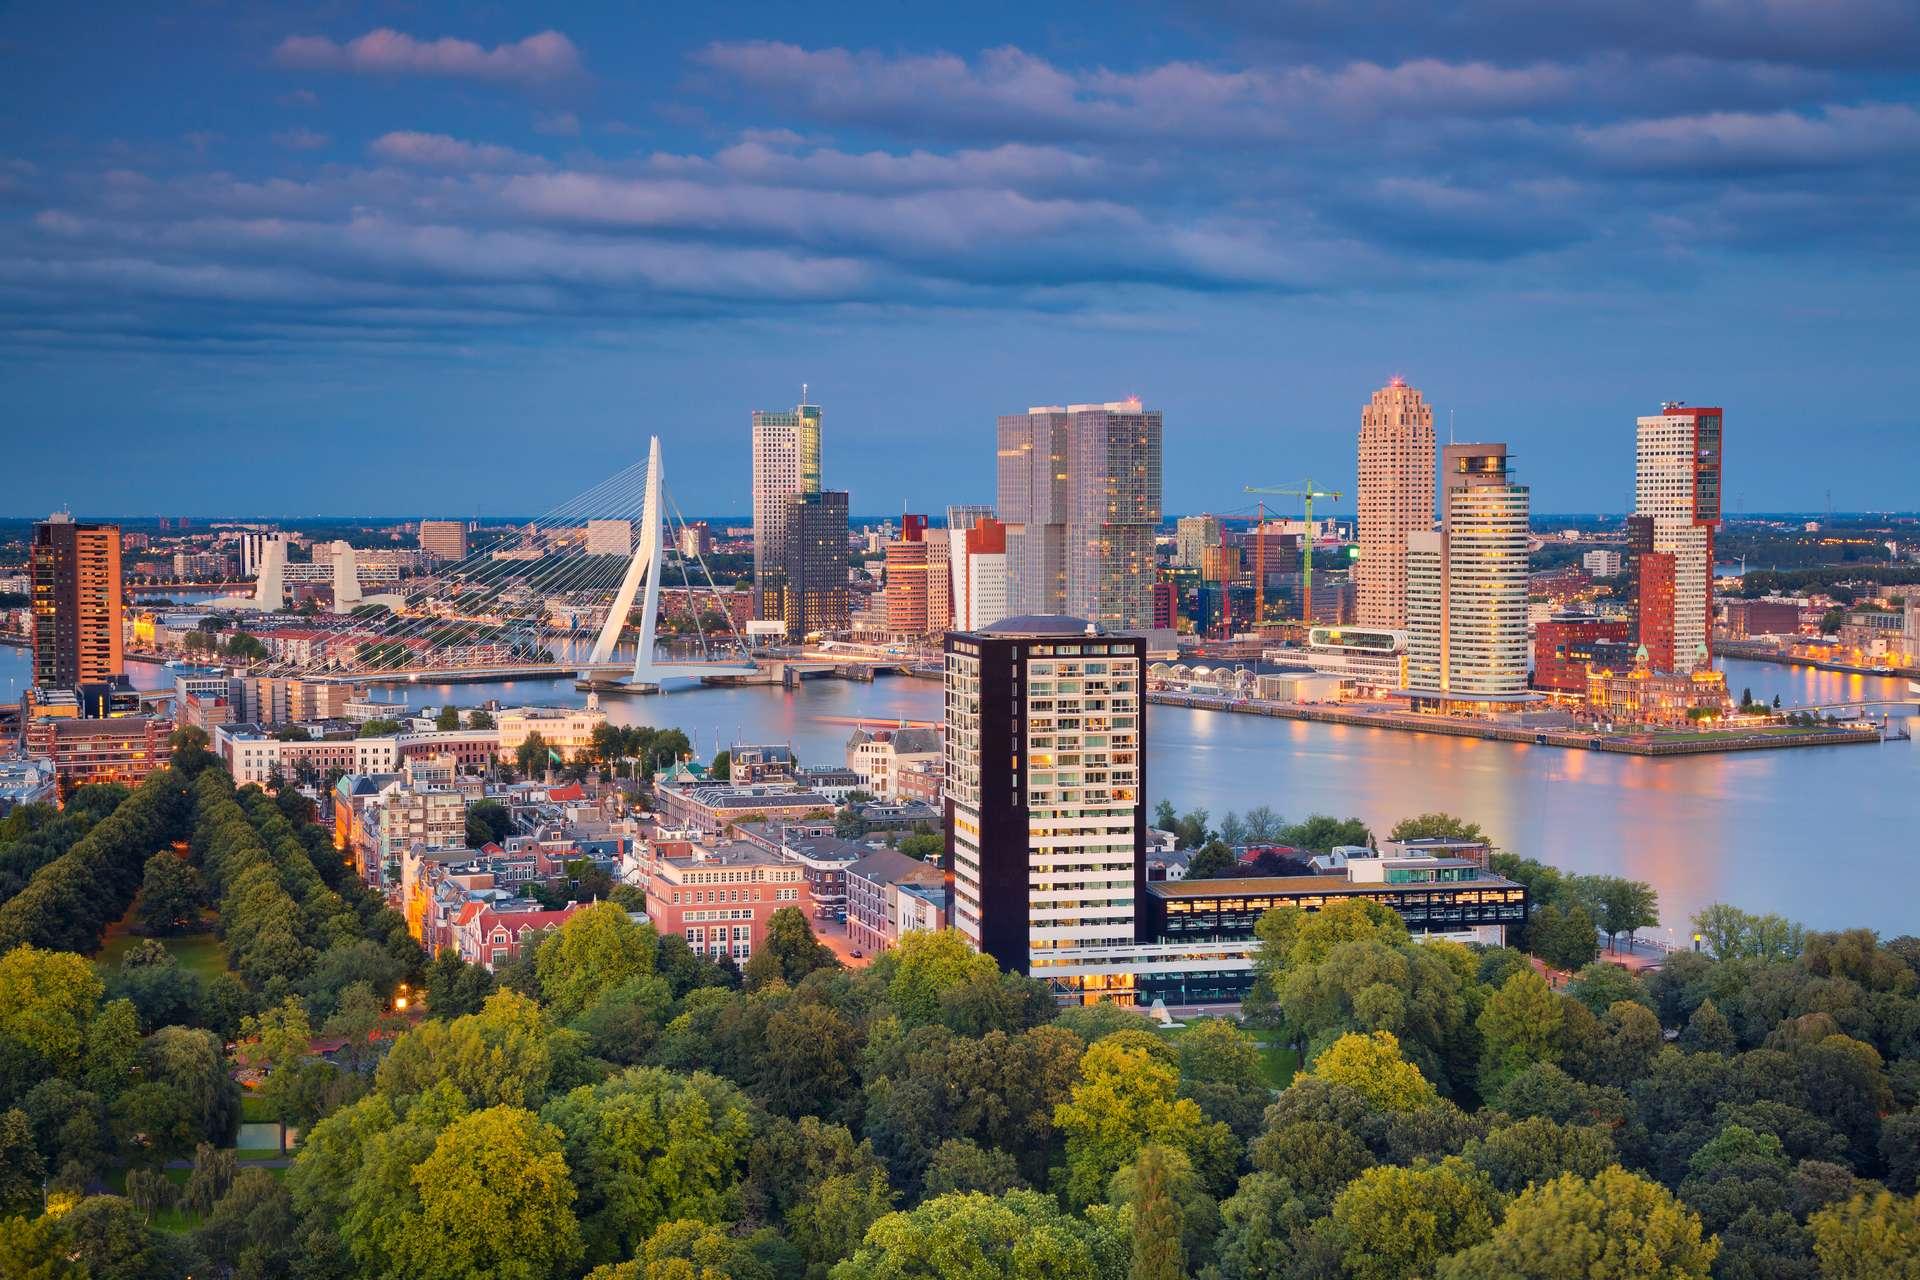 Goedkope stedentrip Rotterdam